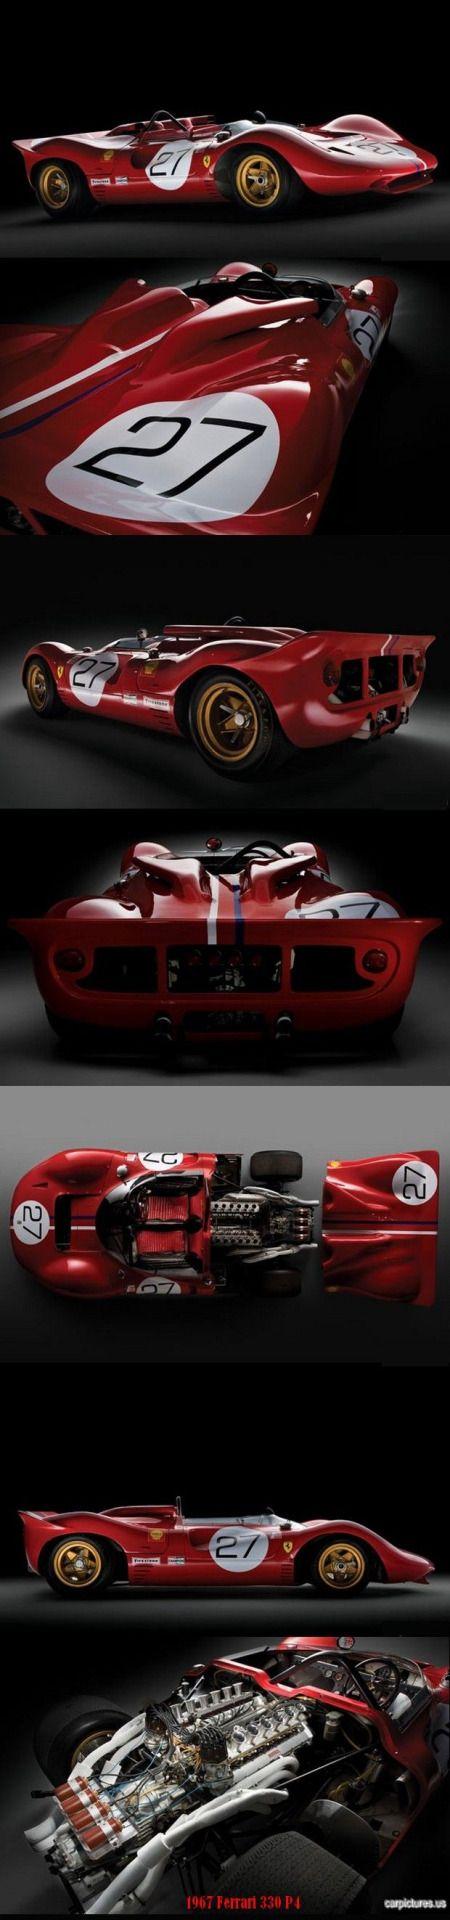 Furniture of america clint twin metal race car bed in red - 1967 Ferrari 330 P4 Race Carssports